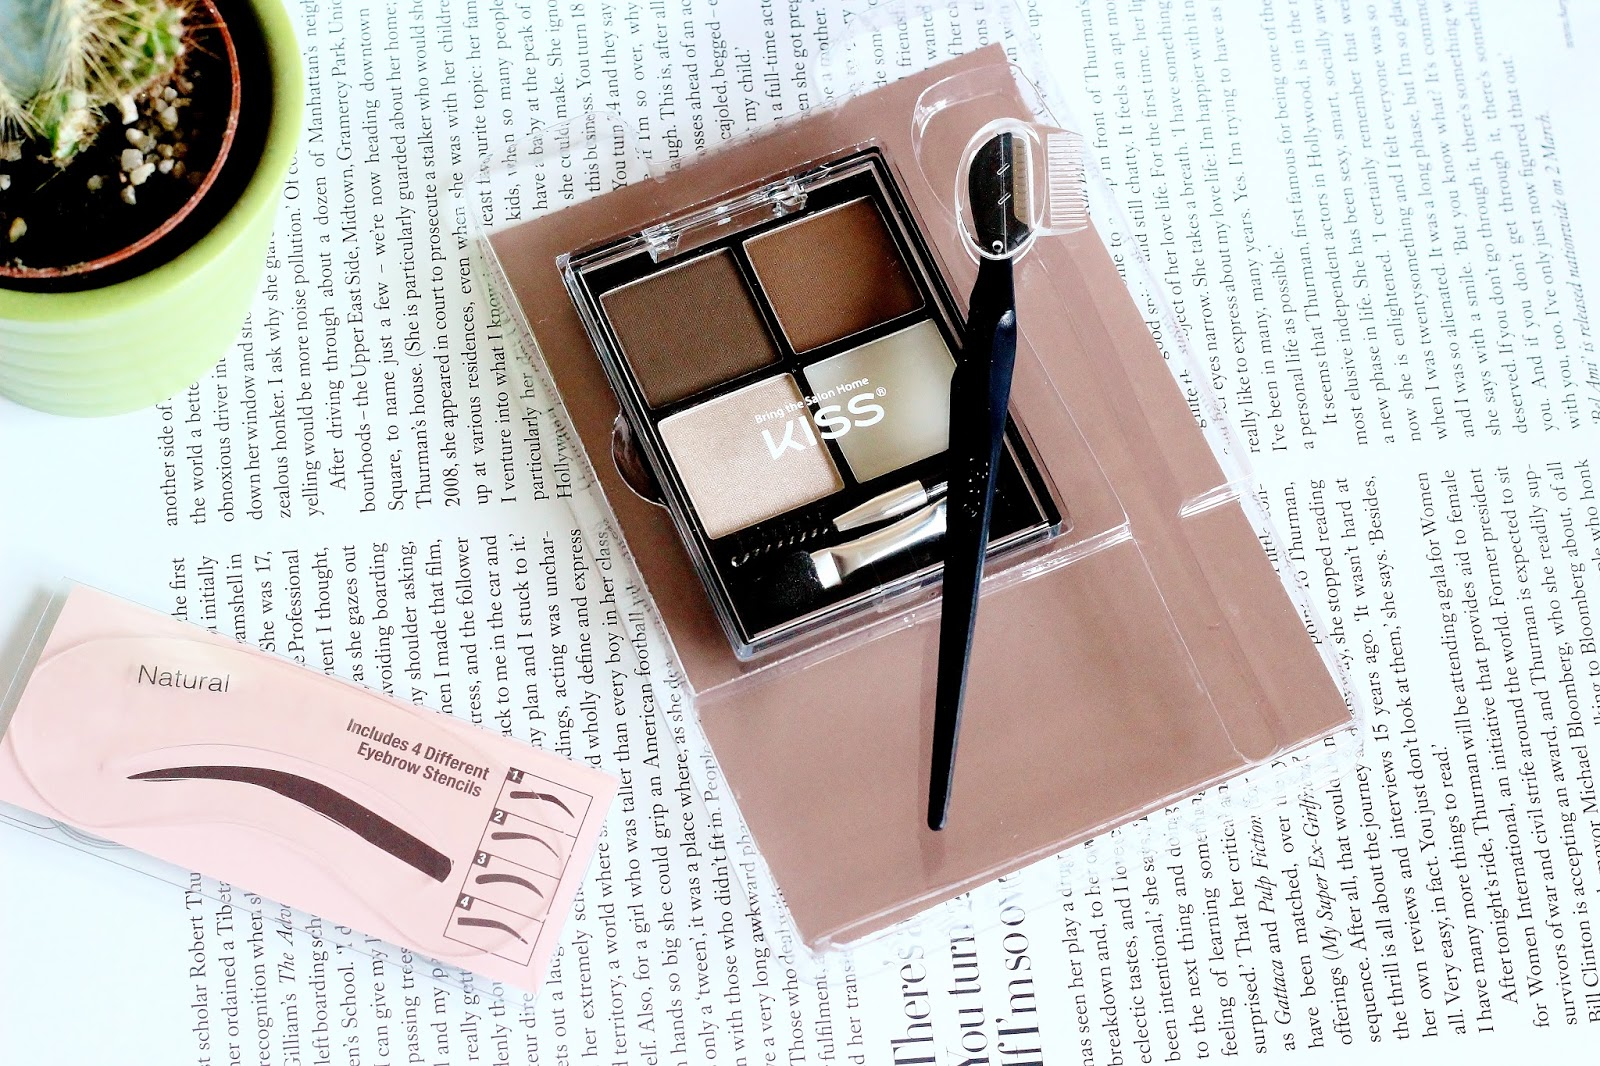 kiss beautiful brow kit the ultimate brow bar review